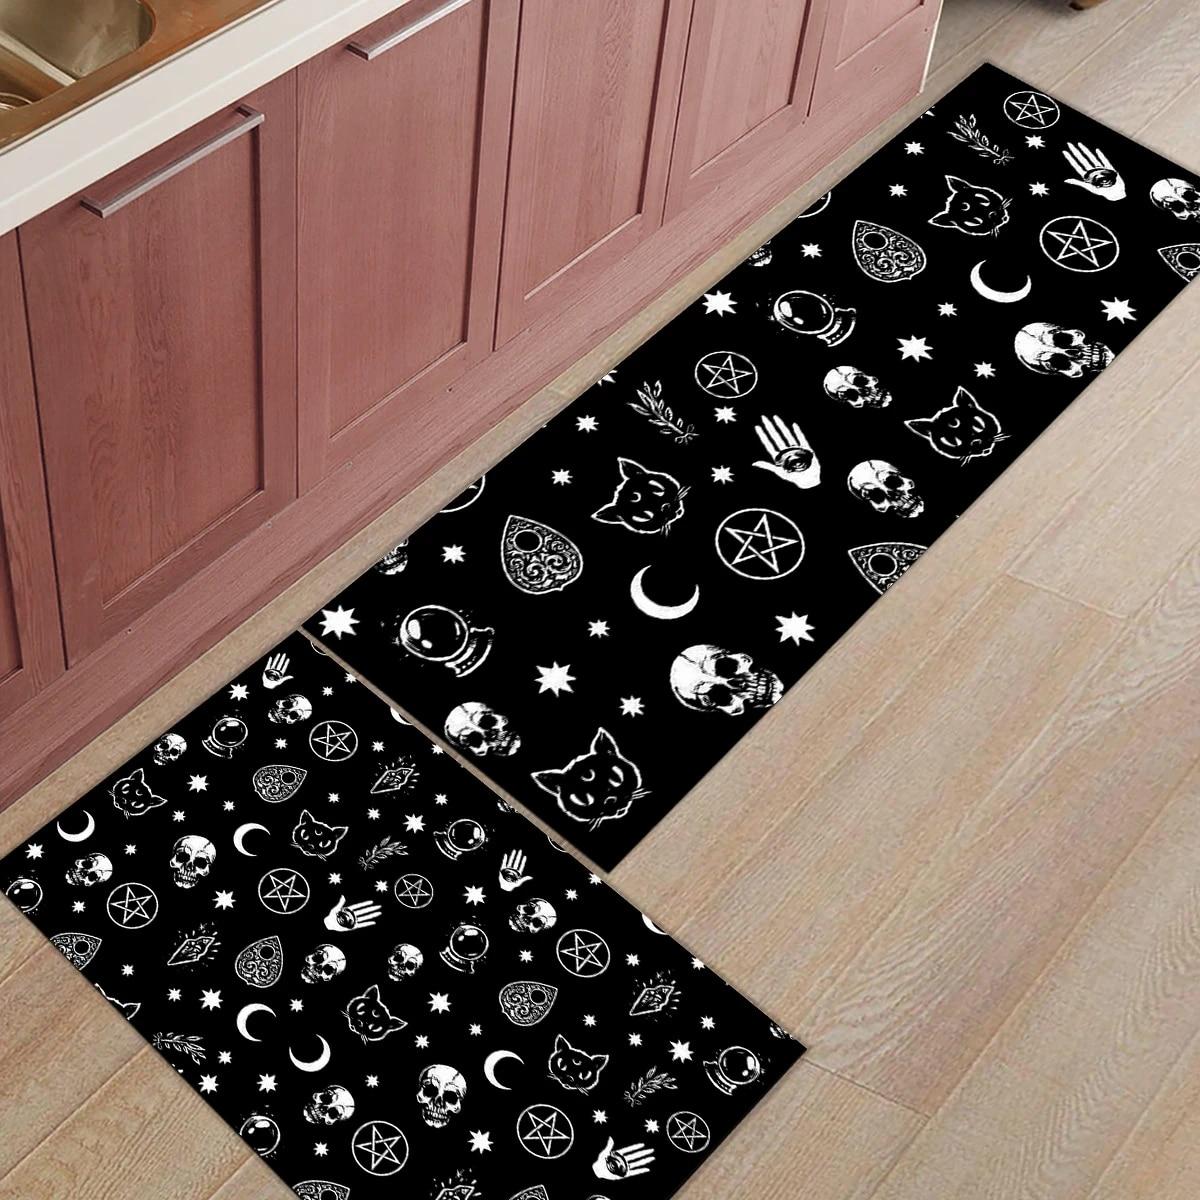 2pcs Set Black Witch Skull Moon Divination Long Kitchen Mat Carpet Floor Mat Home Entrance Doormat Living Room Floor Mats Rug Mat Aliexpress